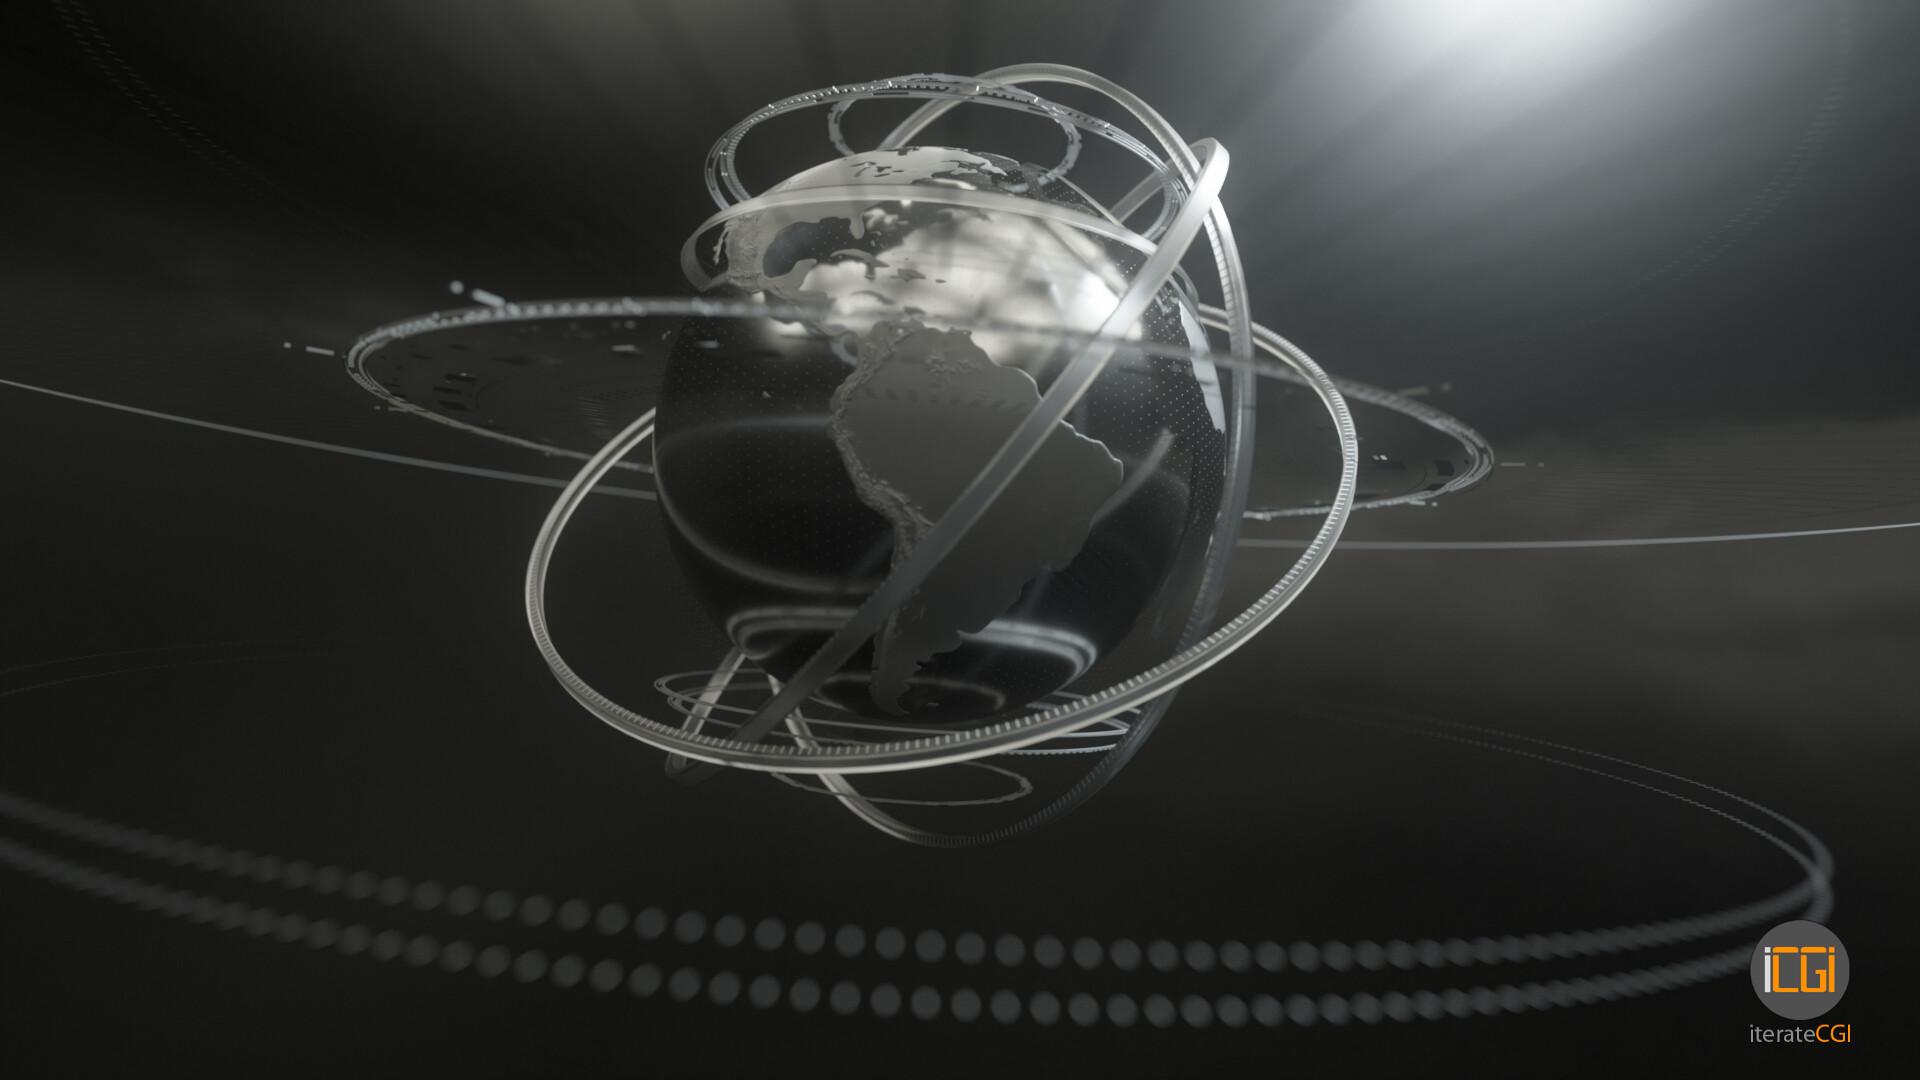 Johan de leenheer globe motion graphic 4